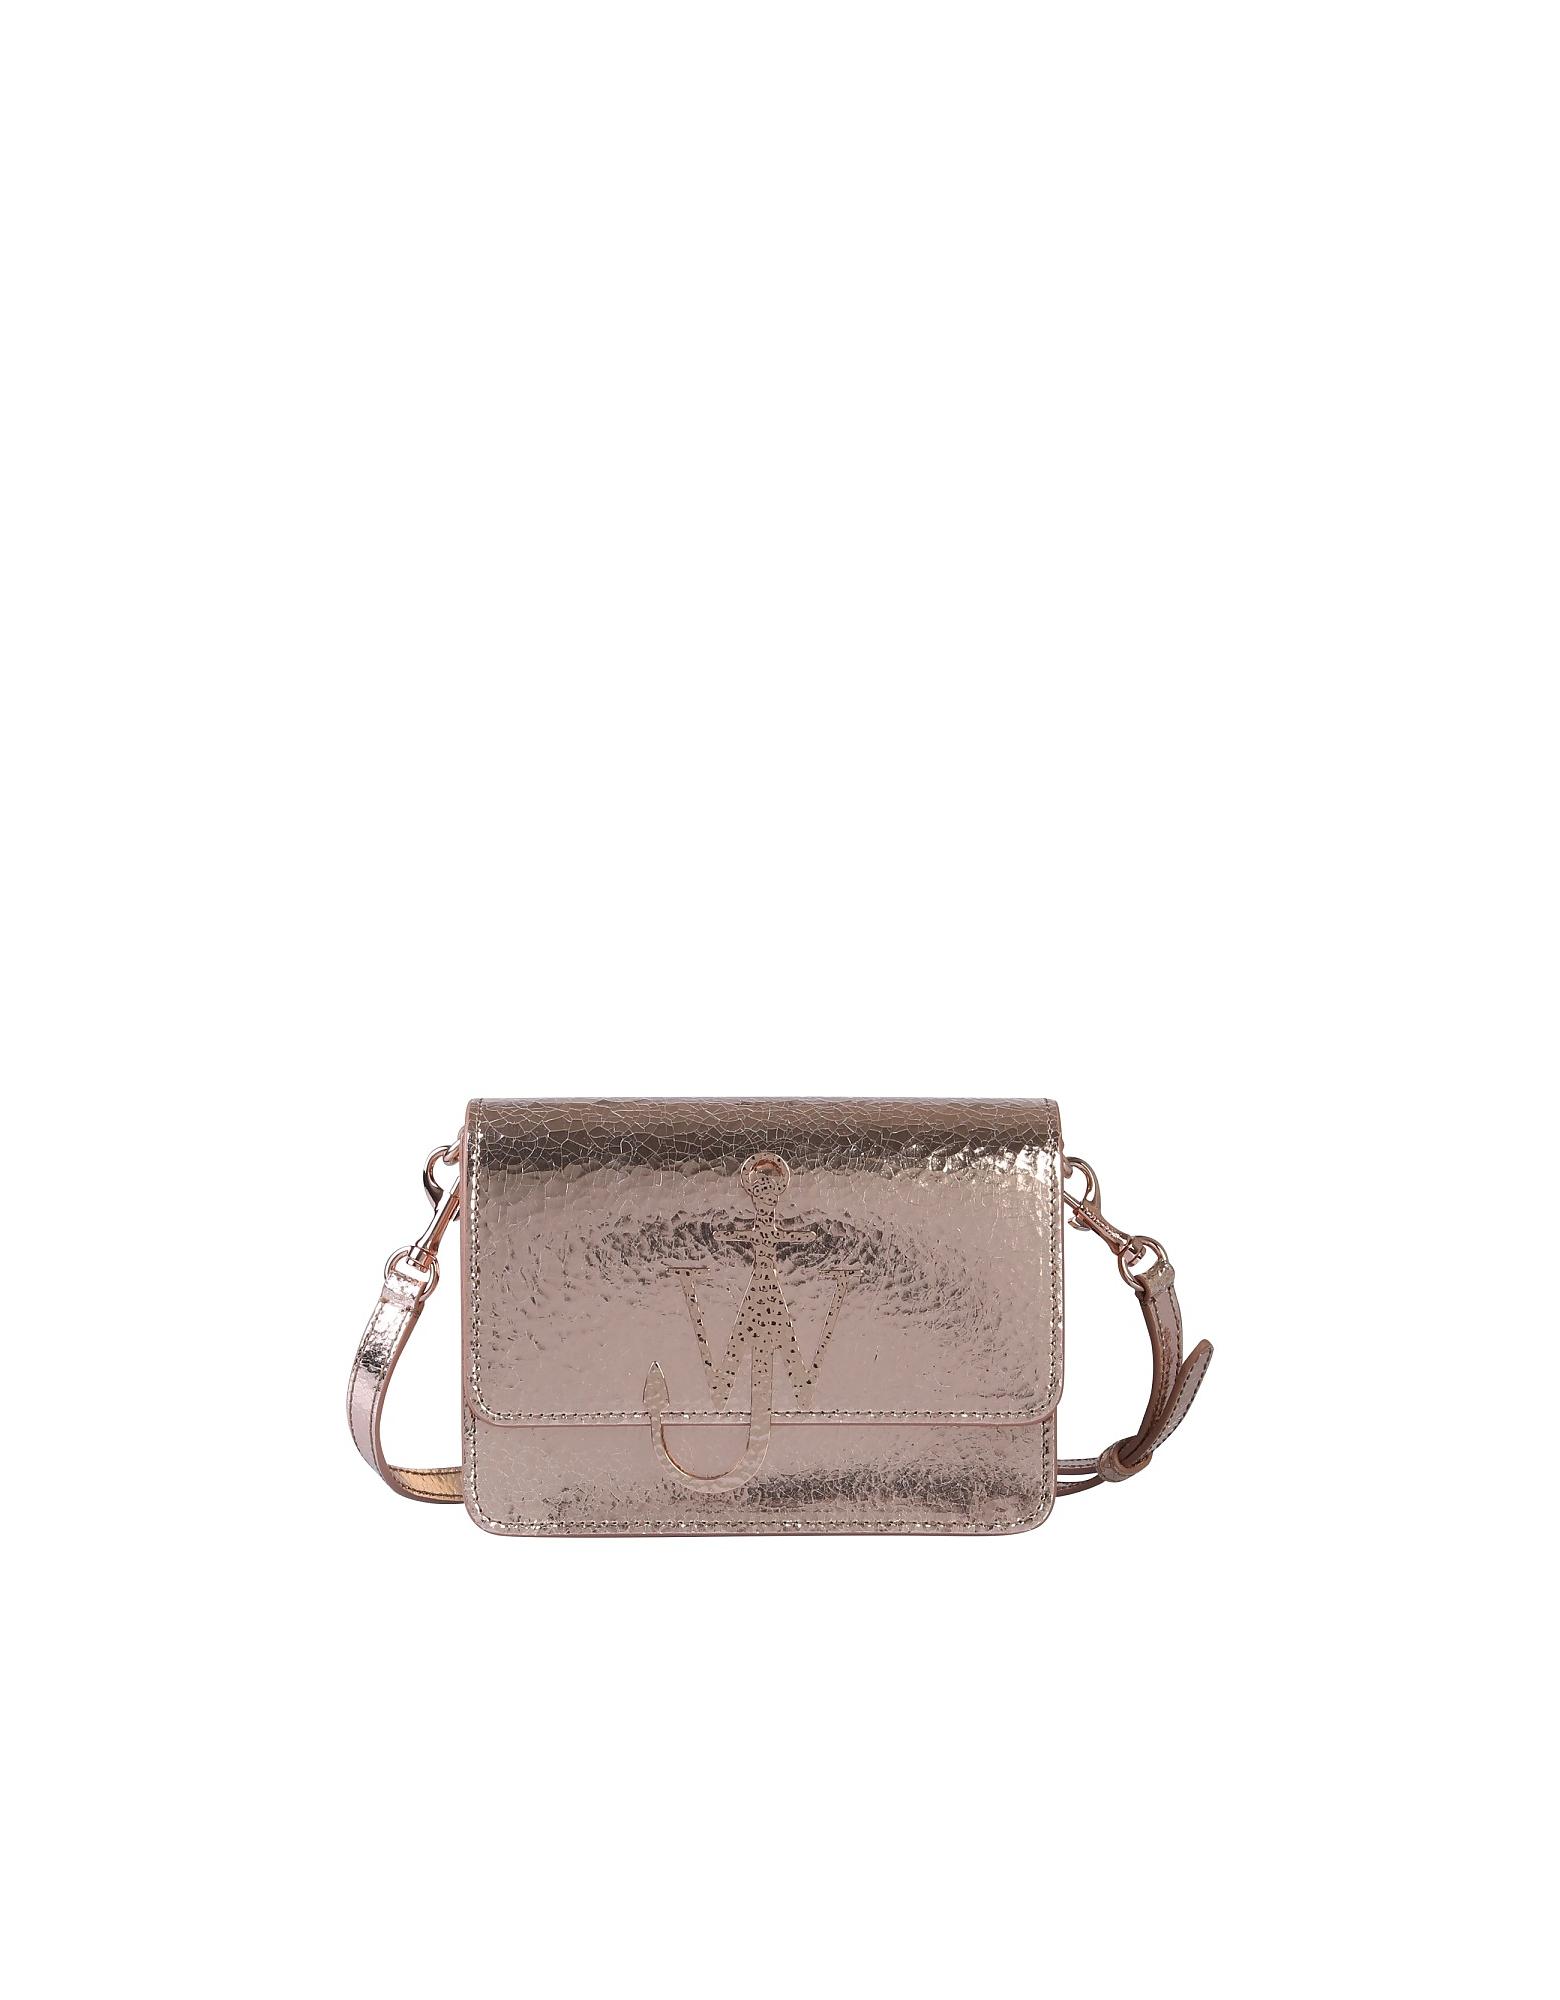 JW Anderson Designer Handbags, Anchor Logo Bag